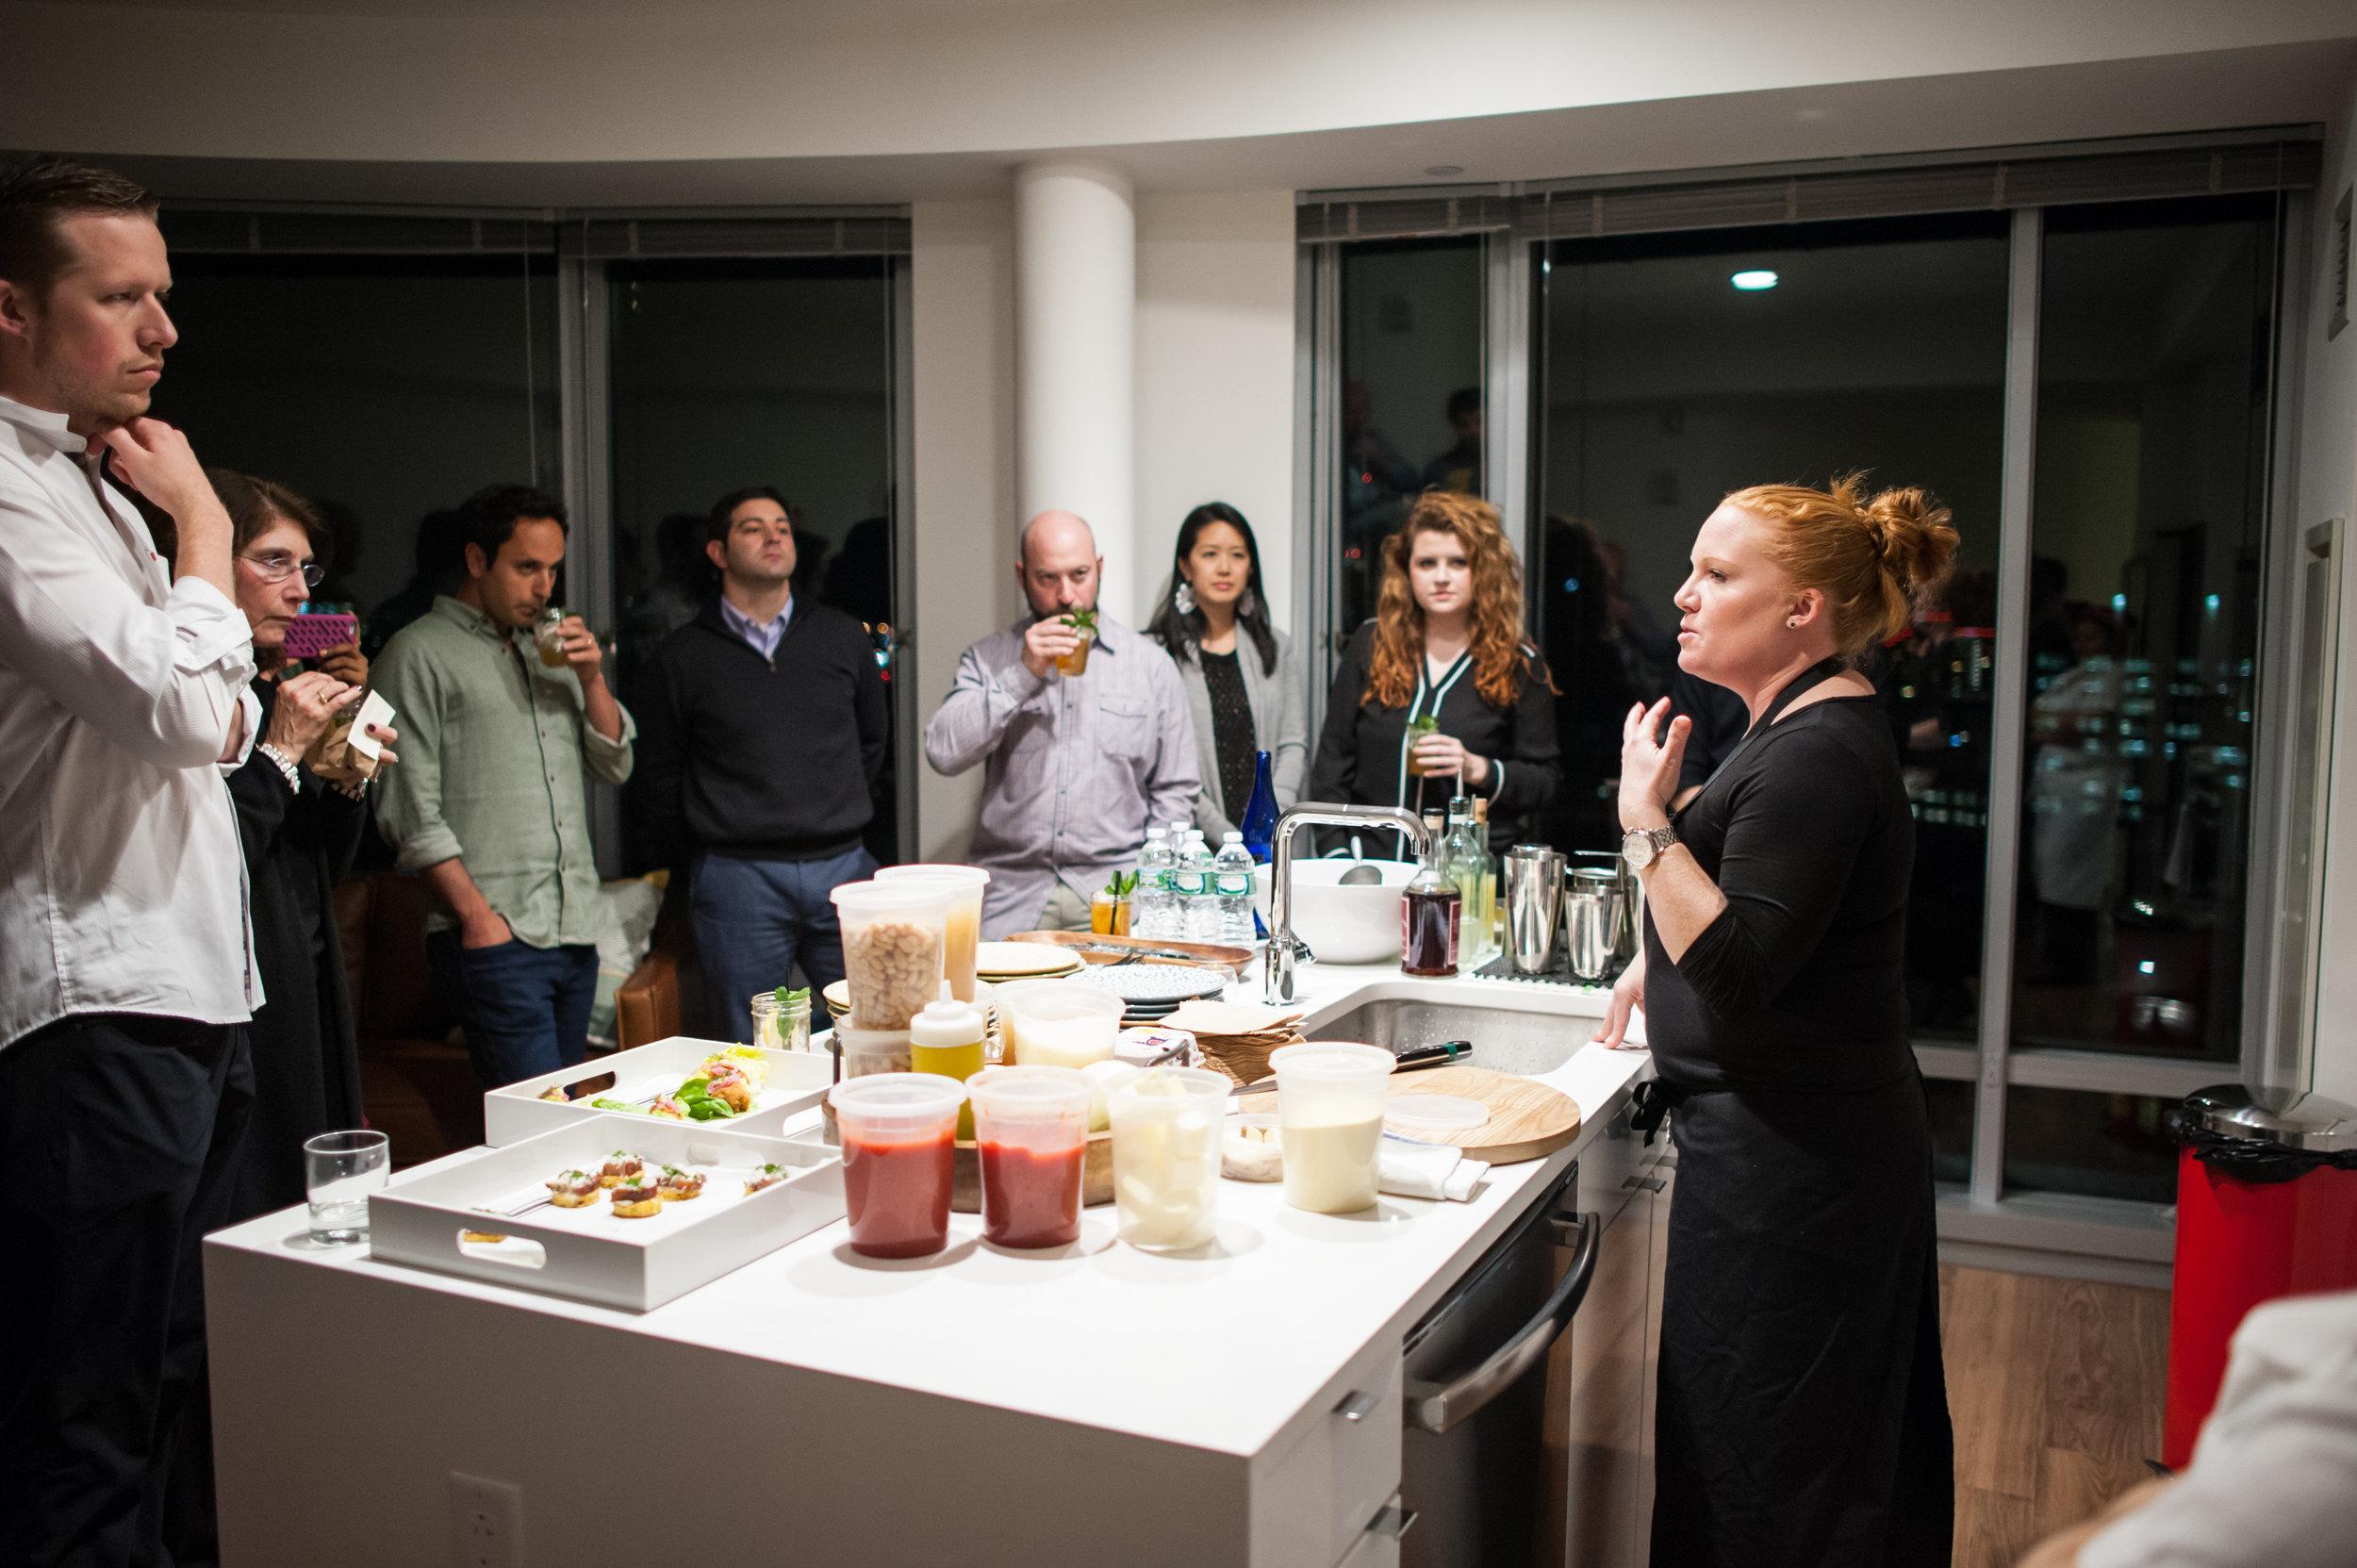 Chef Tiffani Faison's cooking demonstration